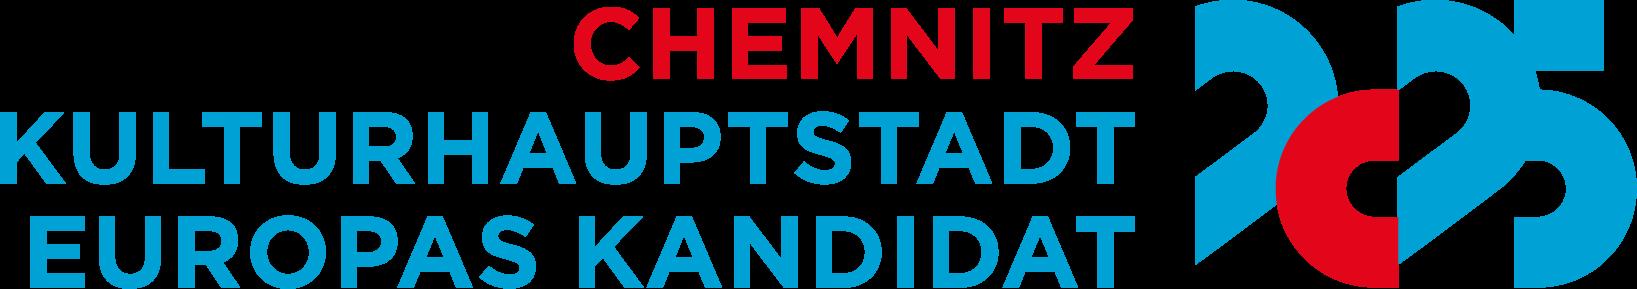 Chemnitz Europäische Kulturhauptstadt 2025 Logo